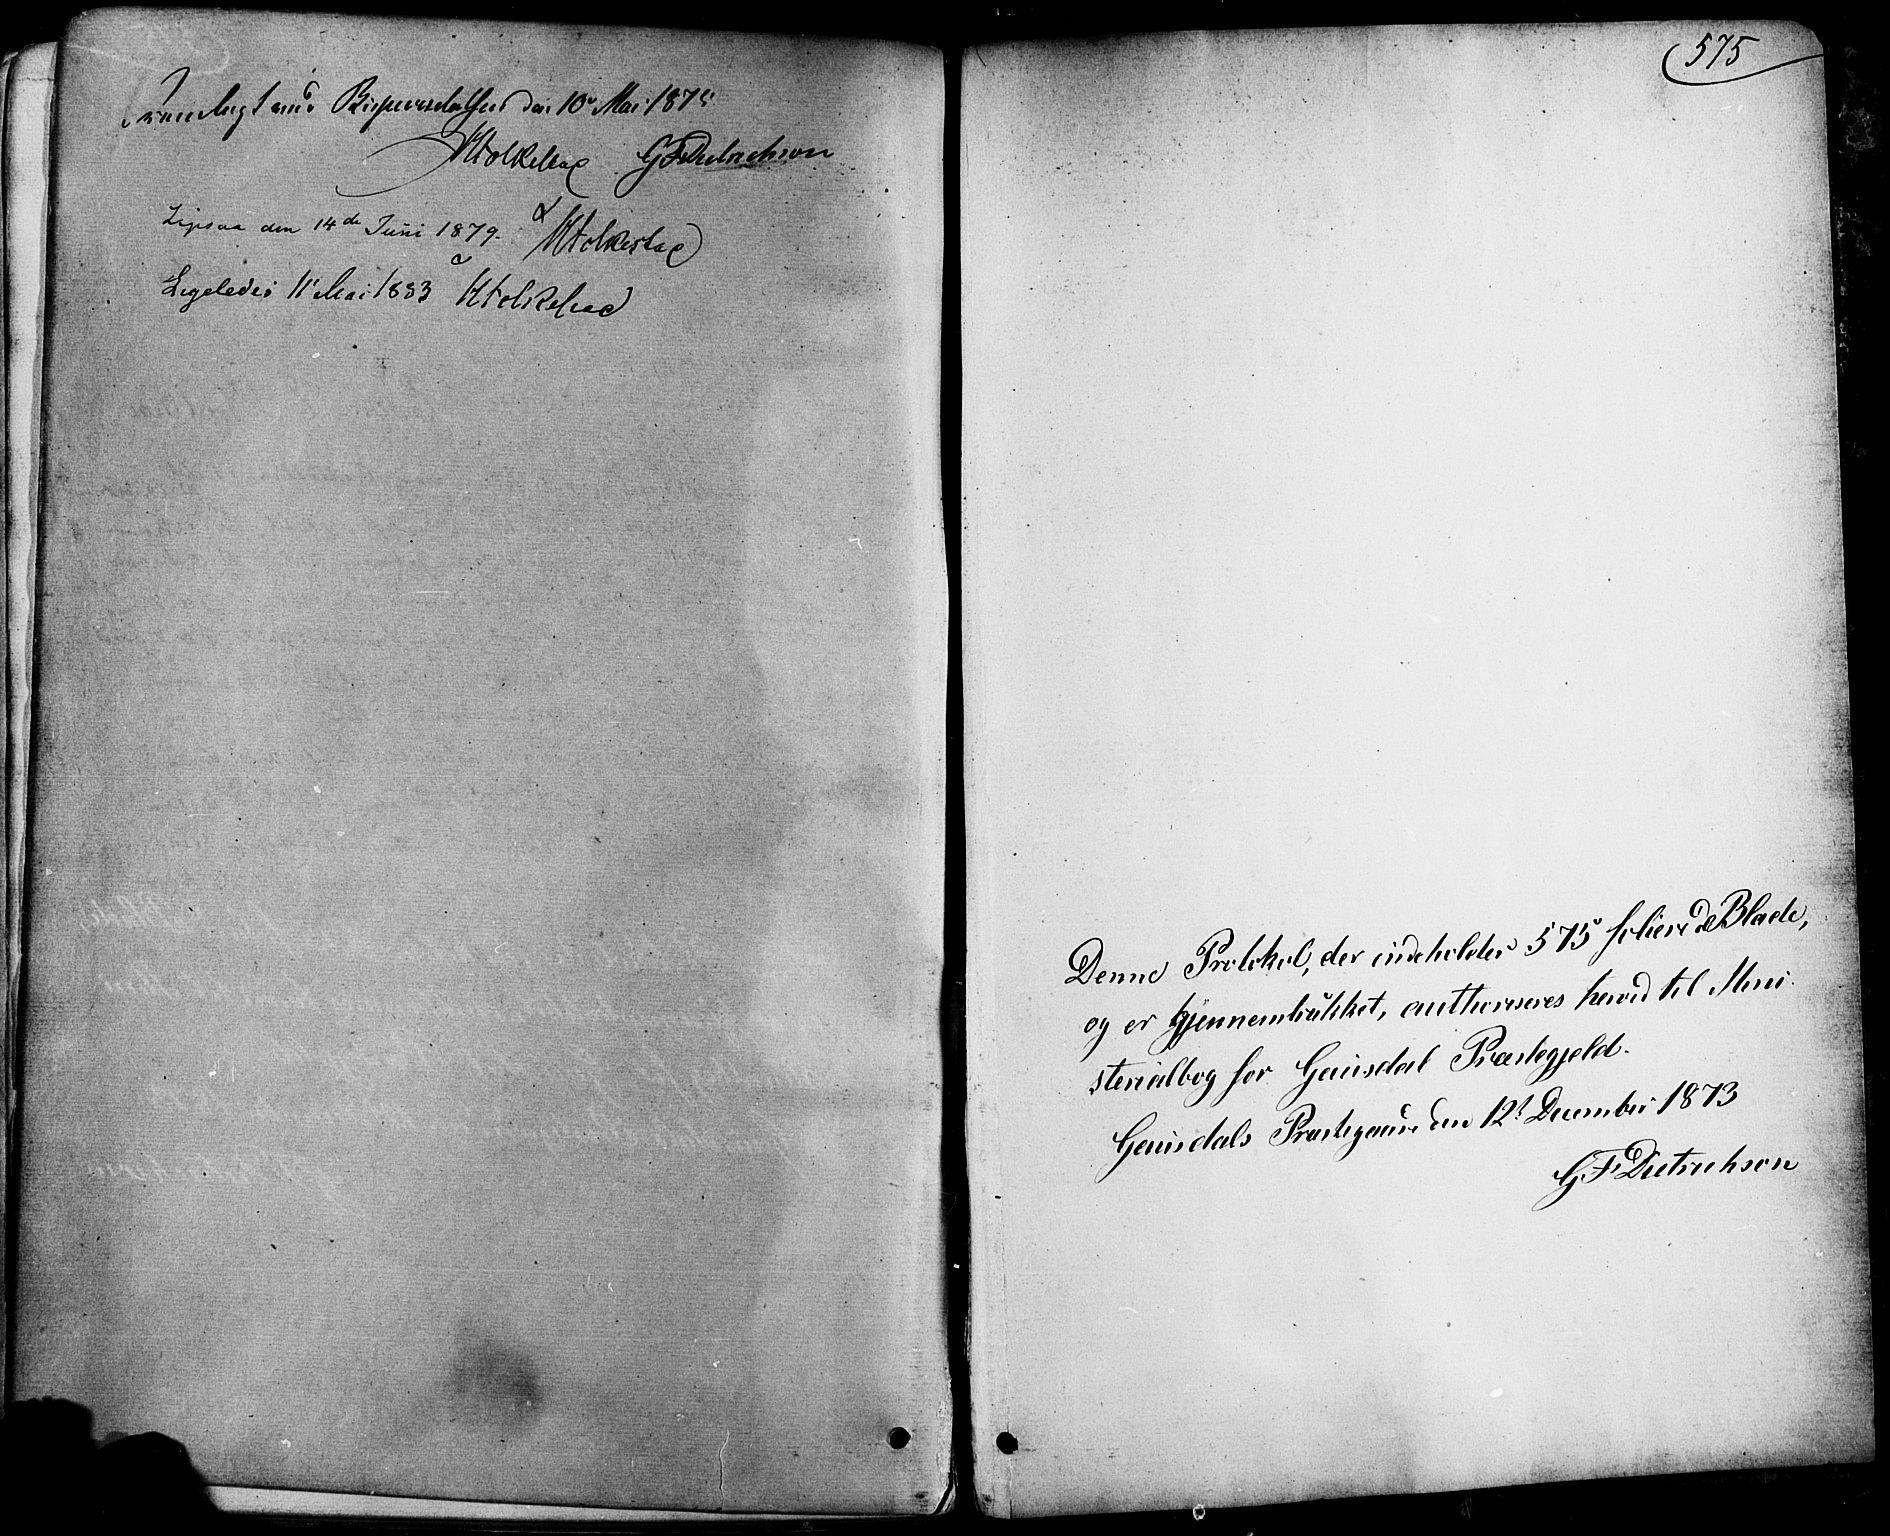 SAH, Østre Gausdal prestekontor, Ministerialbok nr. 1, 1874-1886, s. 575